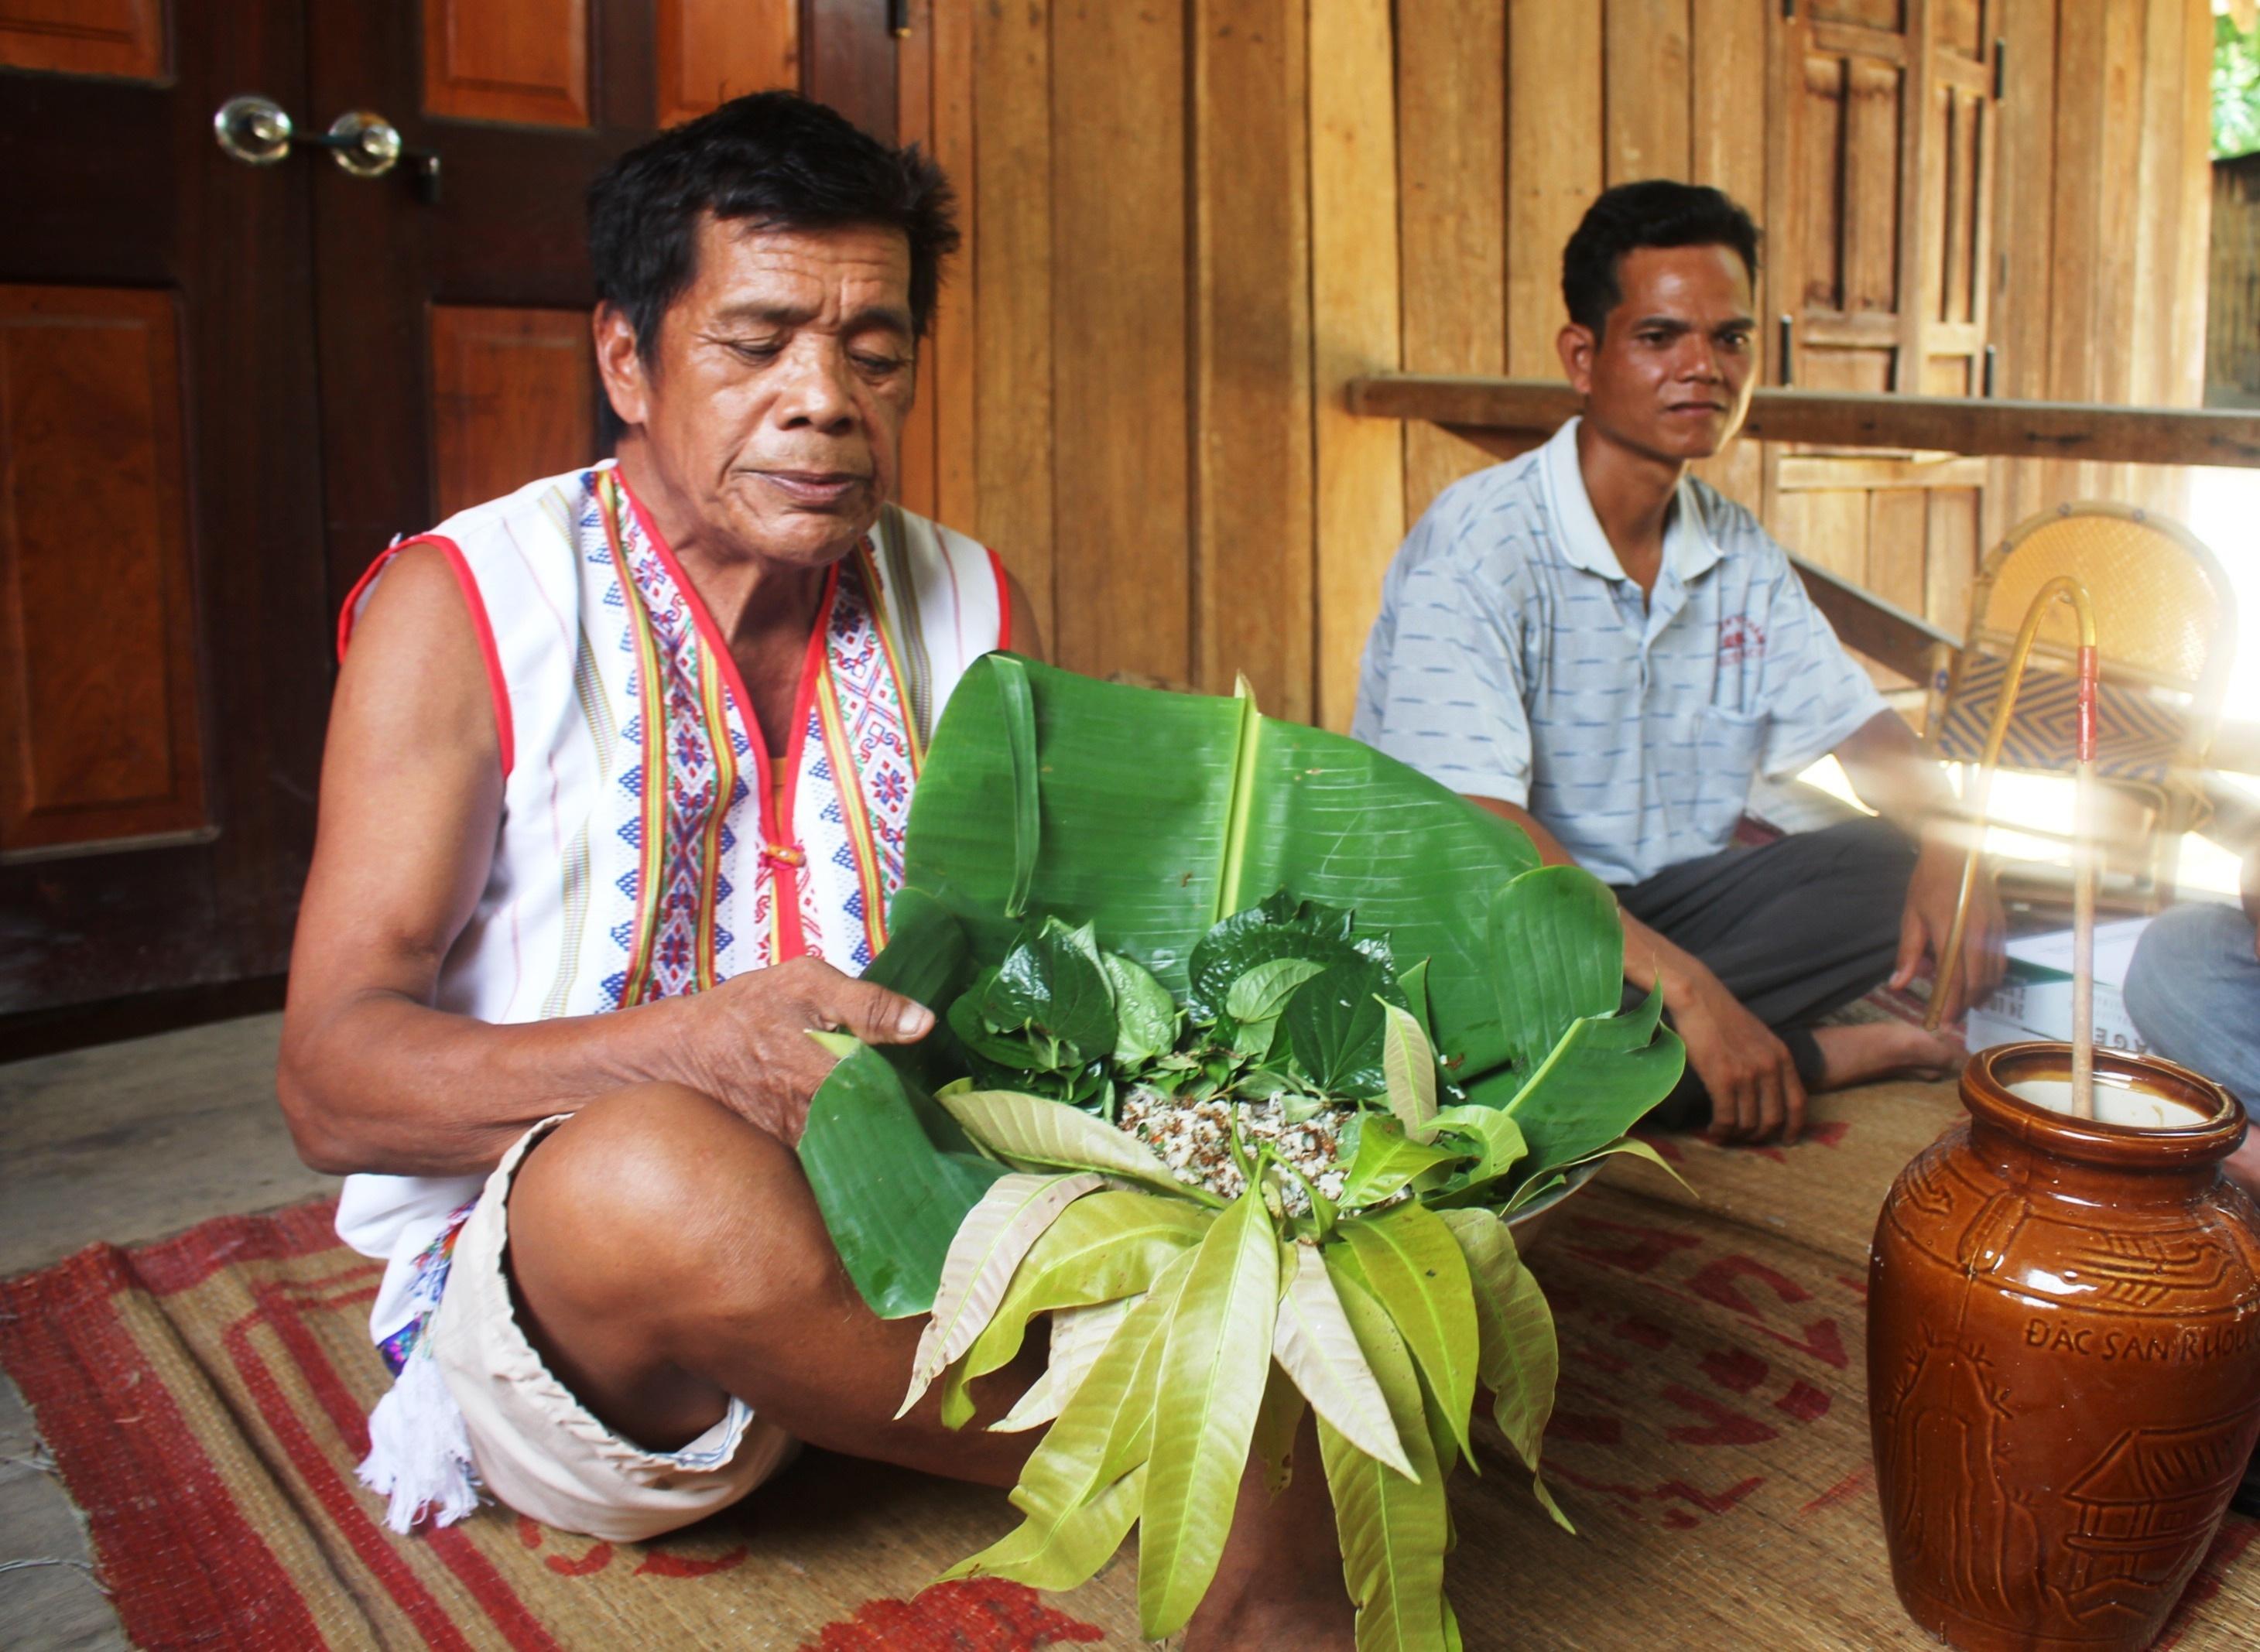 Visit Kon Tum to try ant-fish salad - exclusive dish of Ro Mam ethnic